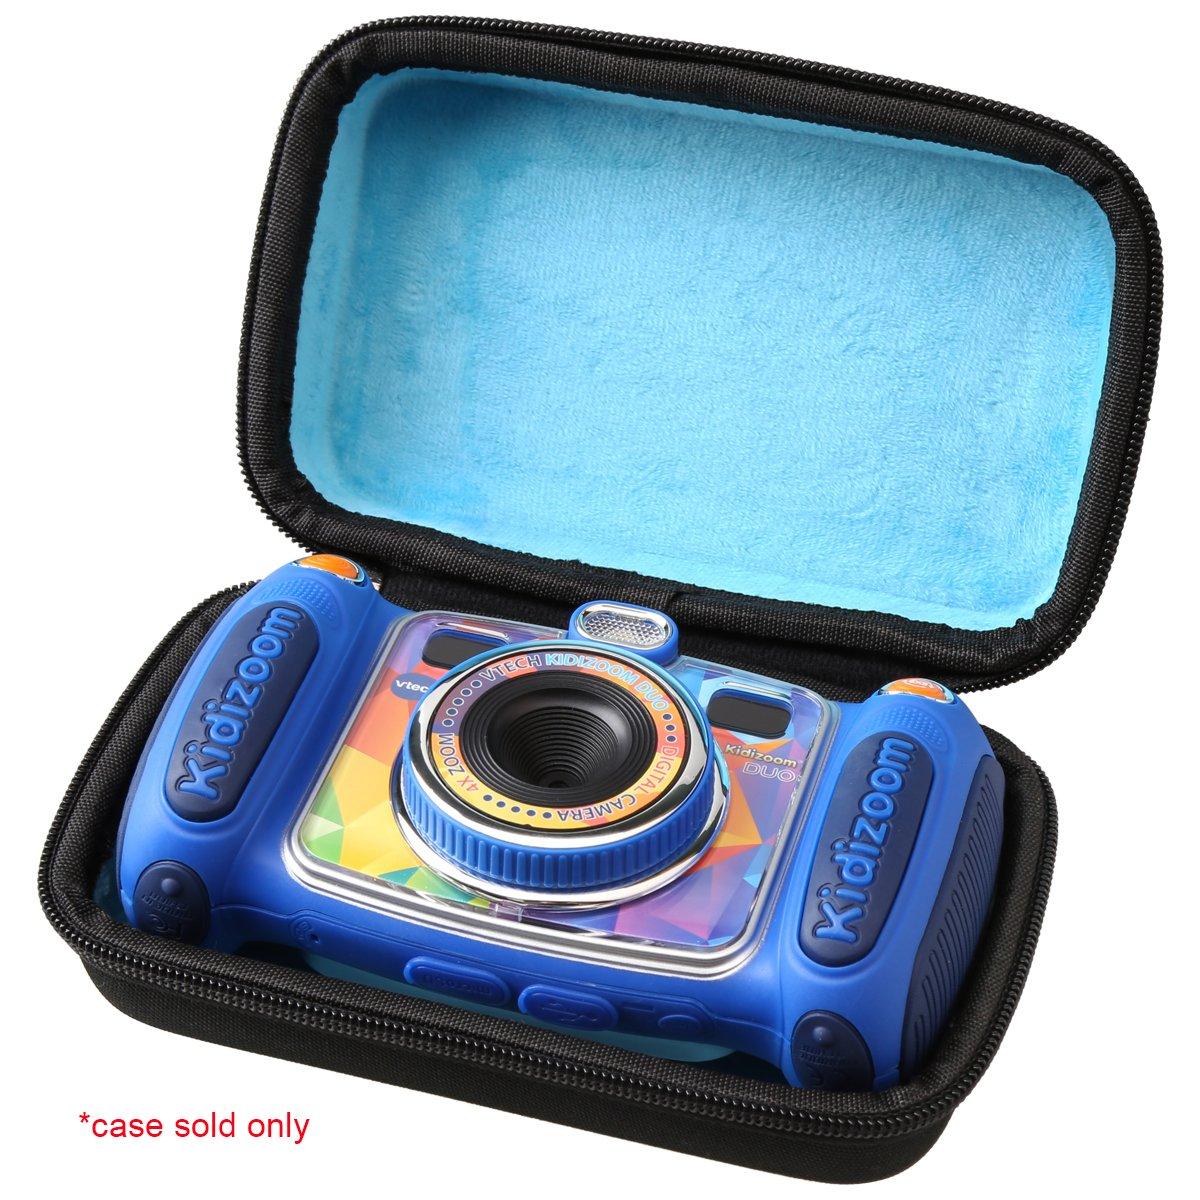 Aproca Hard Carrying Travel Case for VTech Kidizoom Camera Pix / VTech Kidizoom Duo by (black-blue inside)